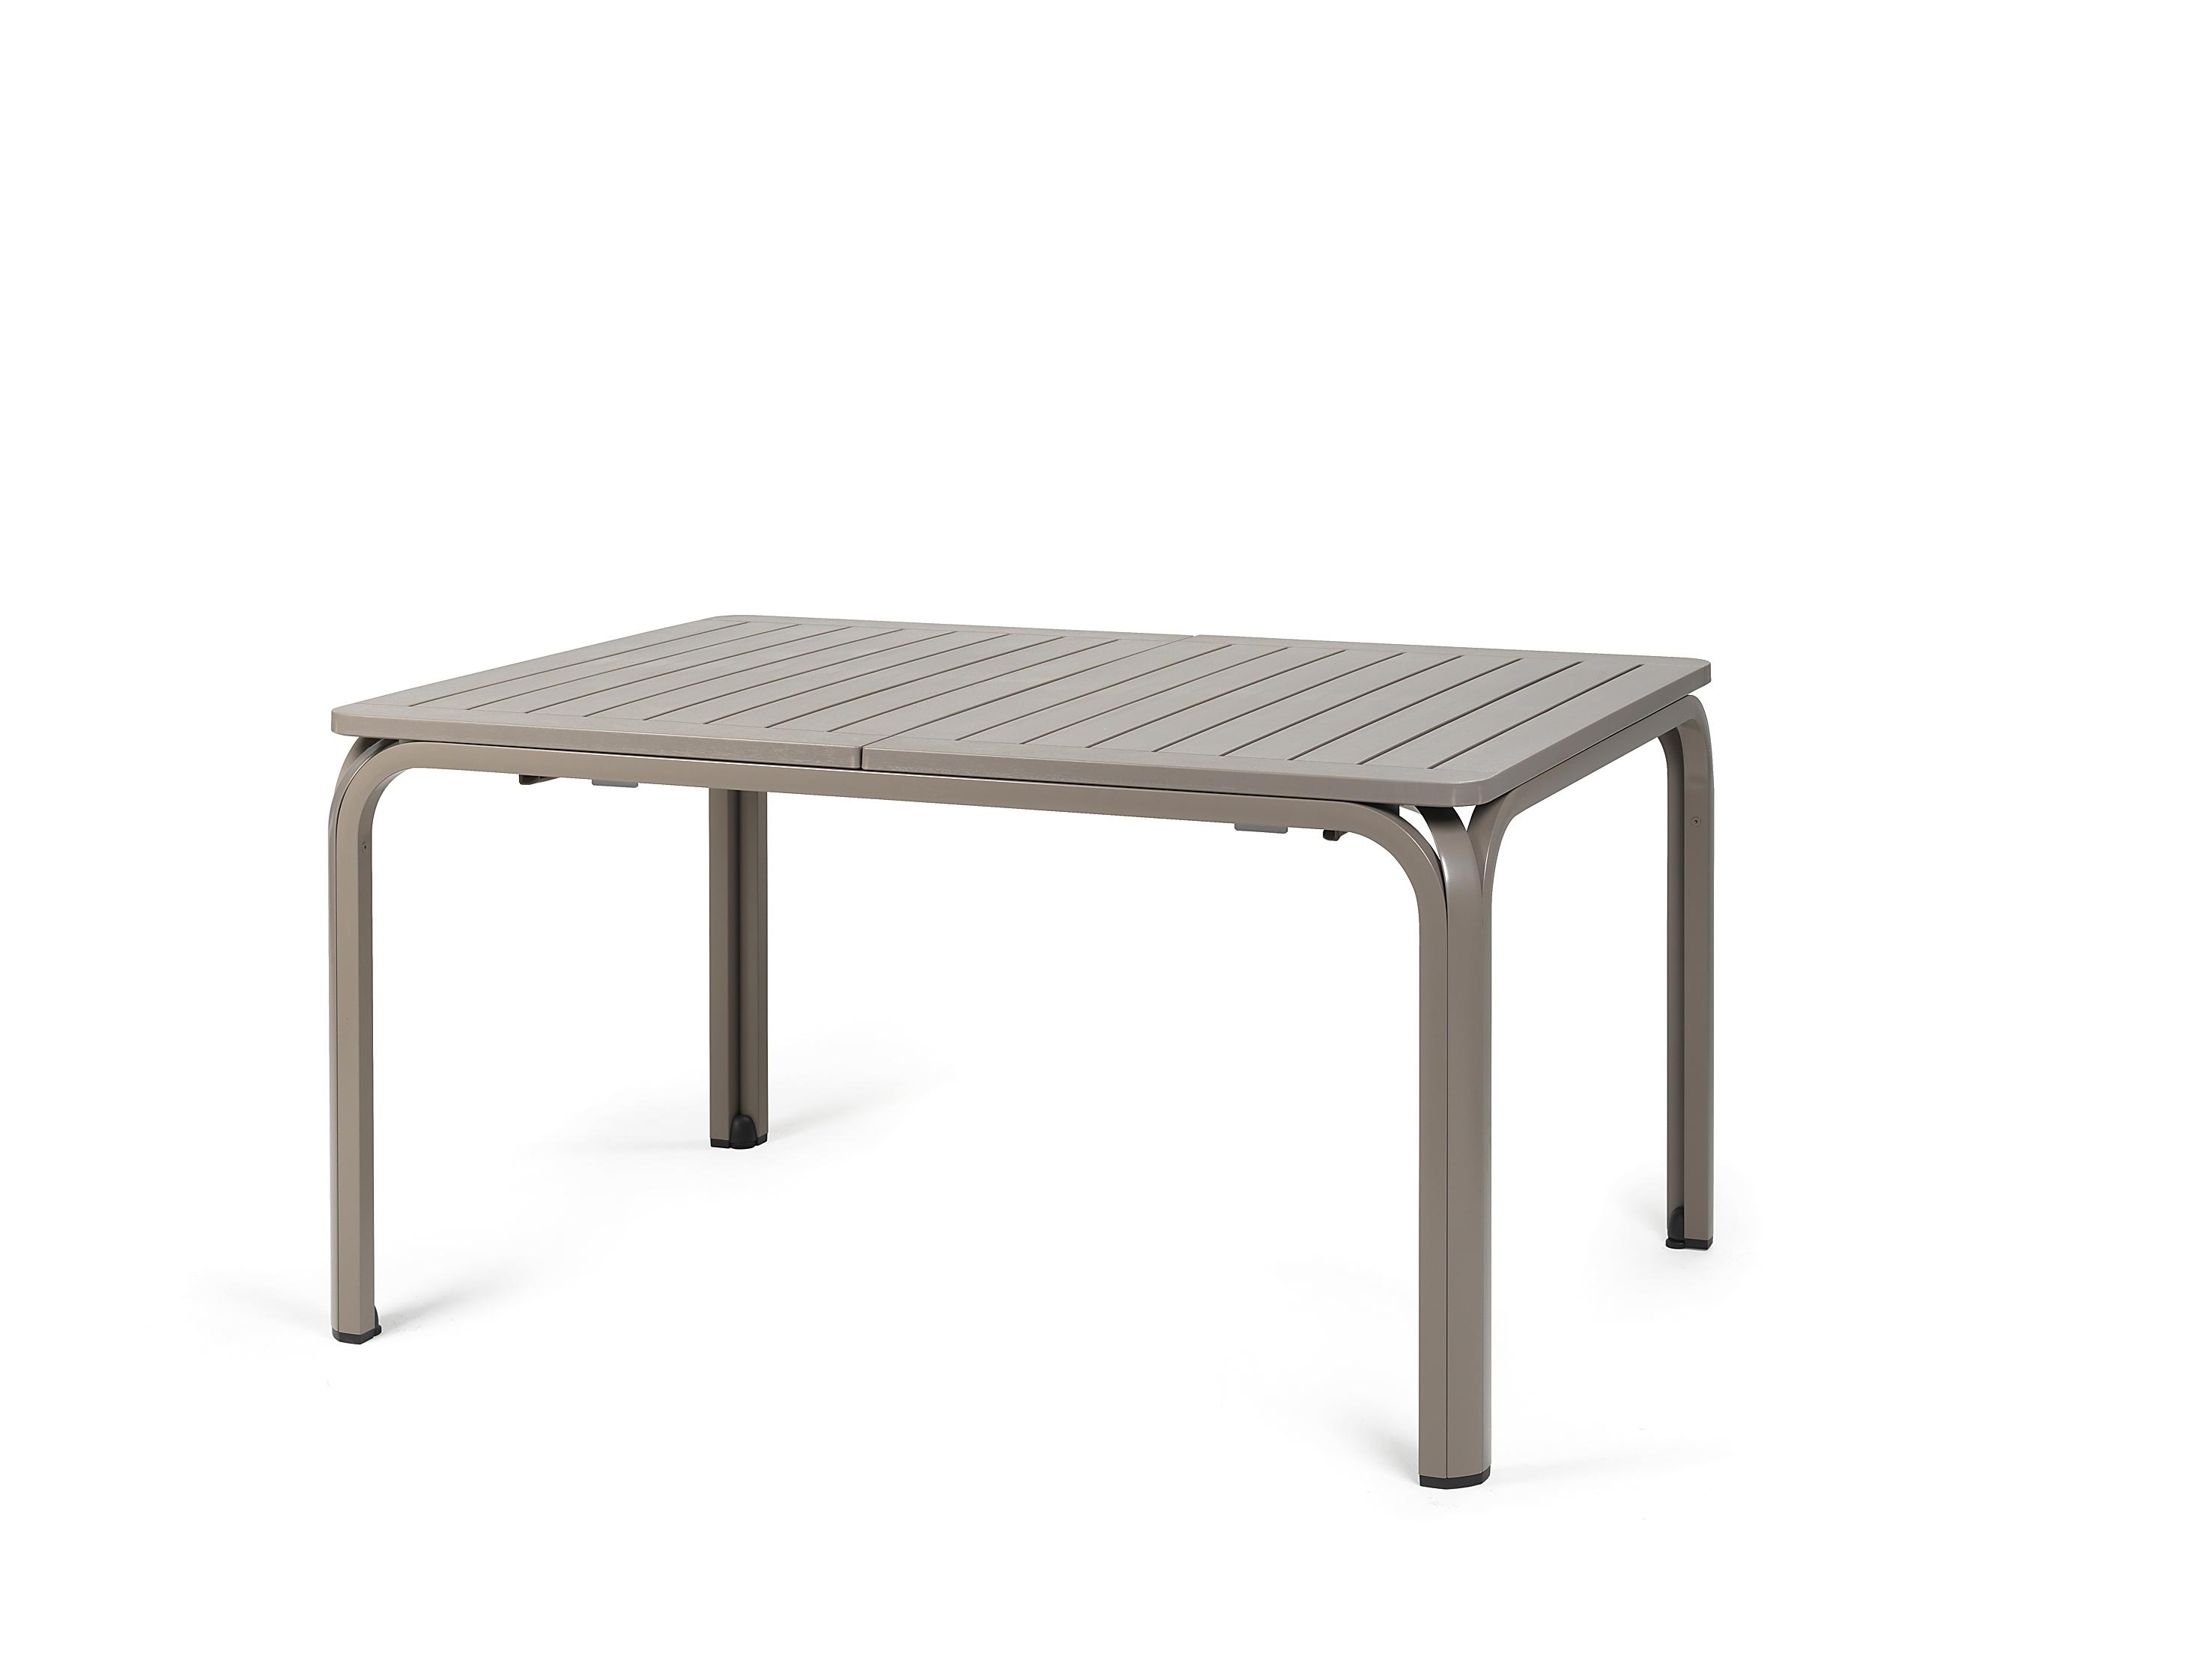 Stół Alloro 140 nardi